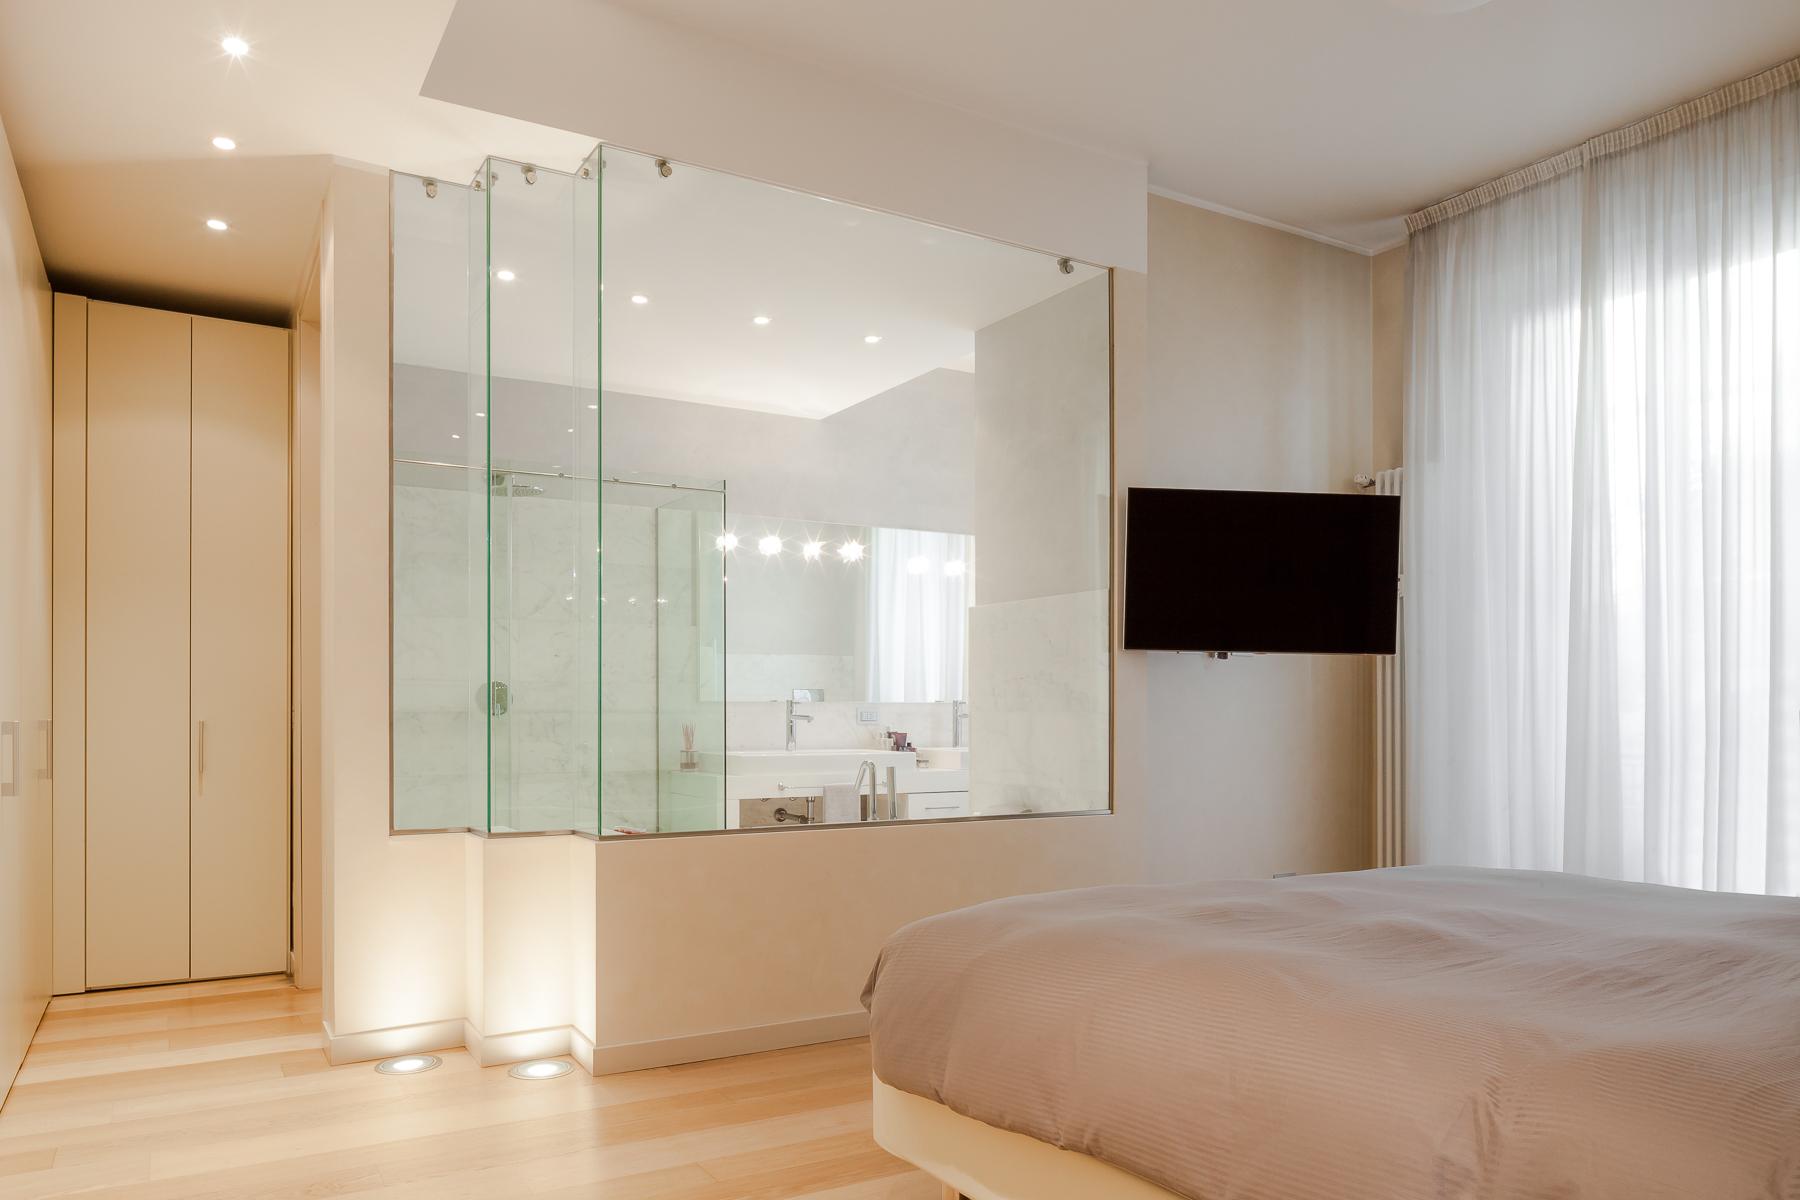 Additional photo for property listing at Elegant apartment in historic Palazzo Corso Venezia Milano, Milan 20121 Italien